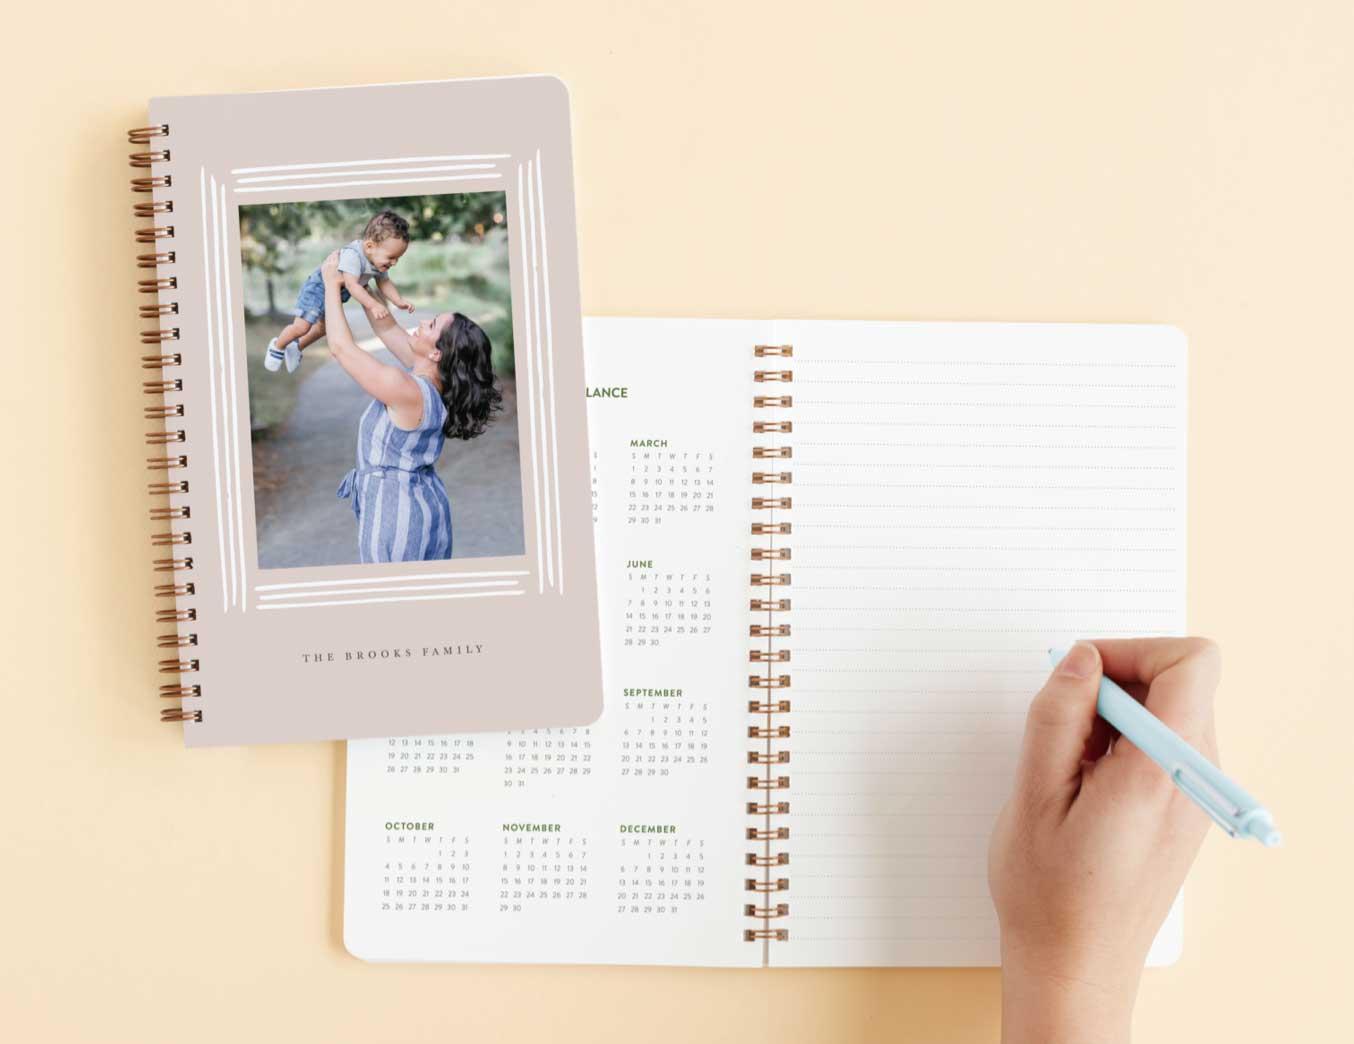 Notebooks, Planners & Address Books